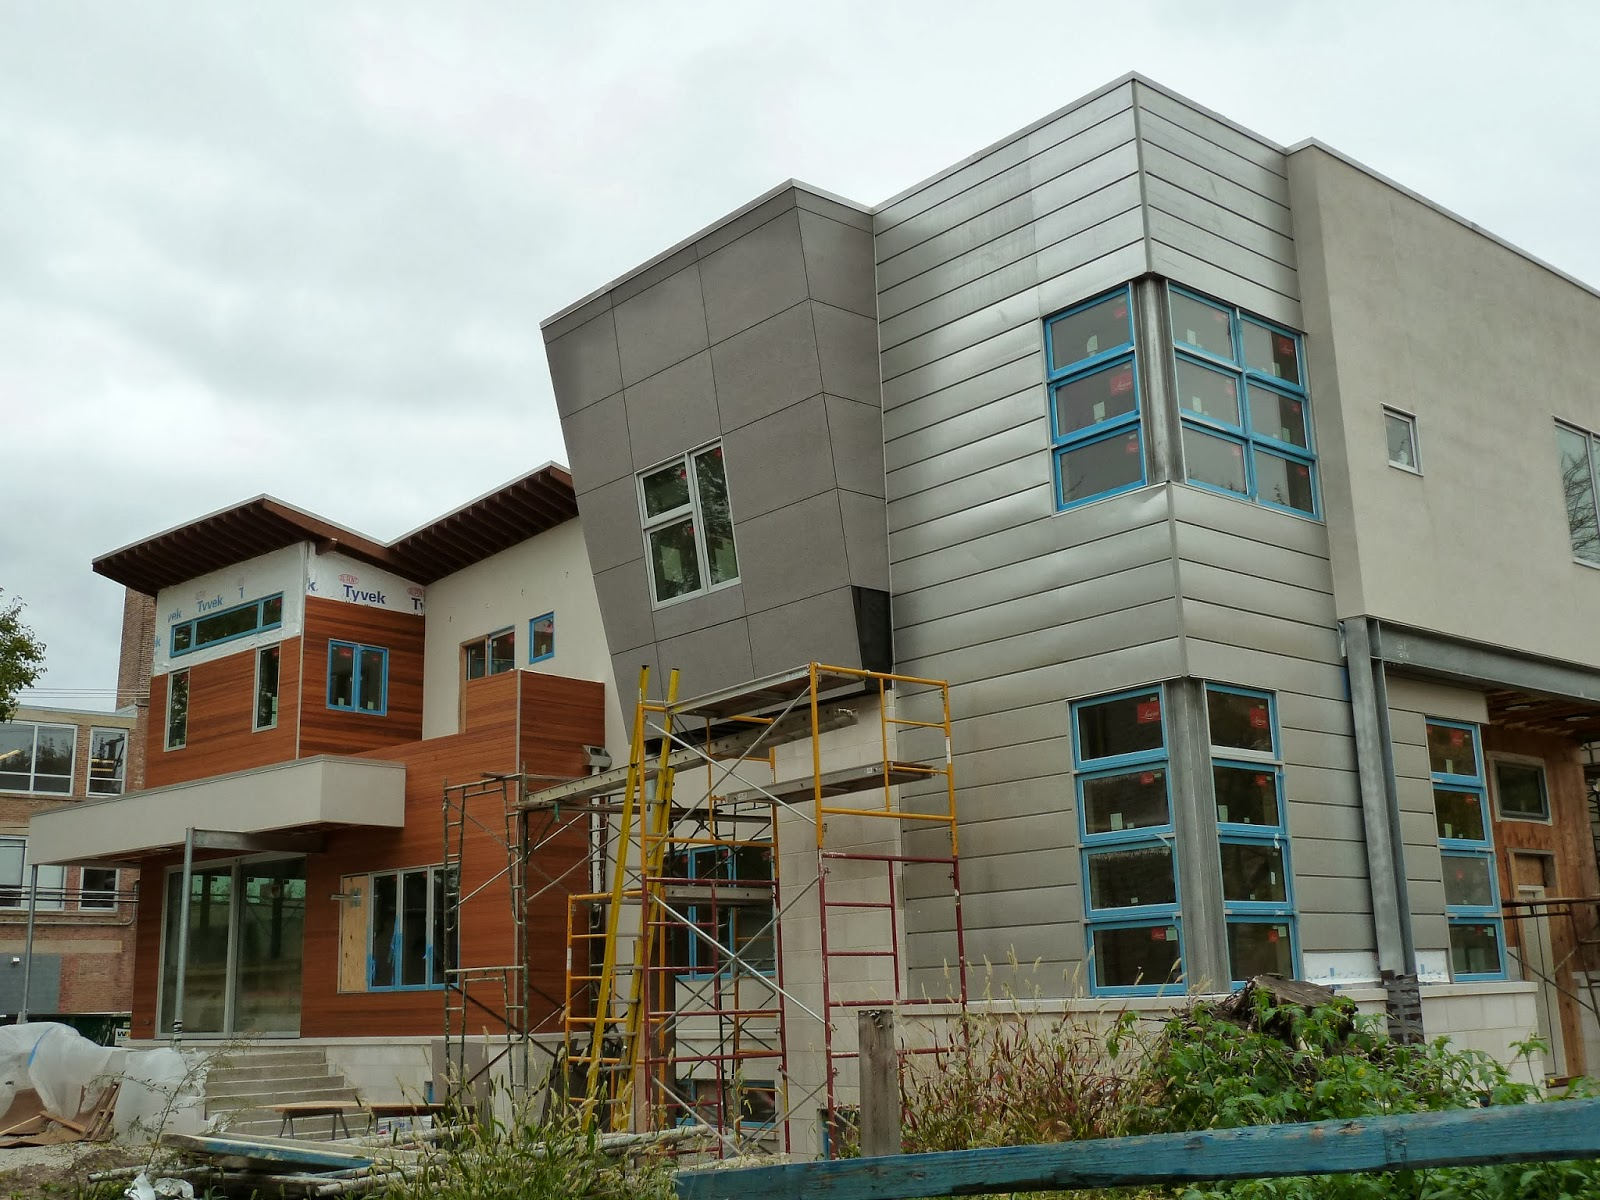 New Builds Hermitage Lane Mansfield